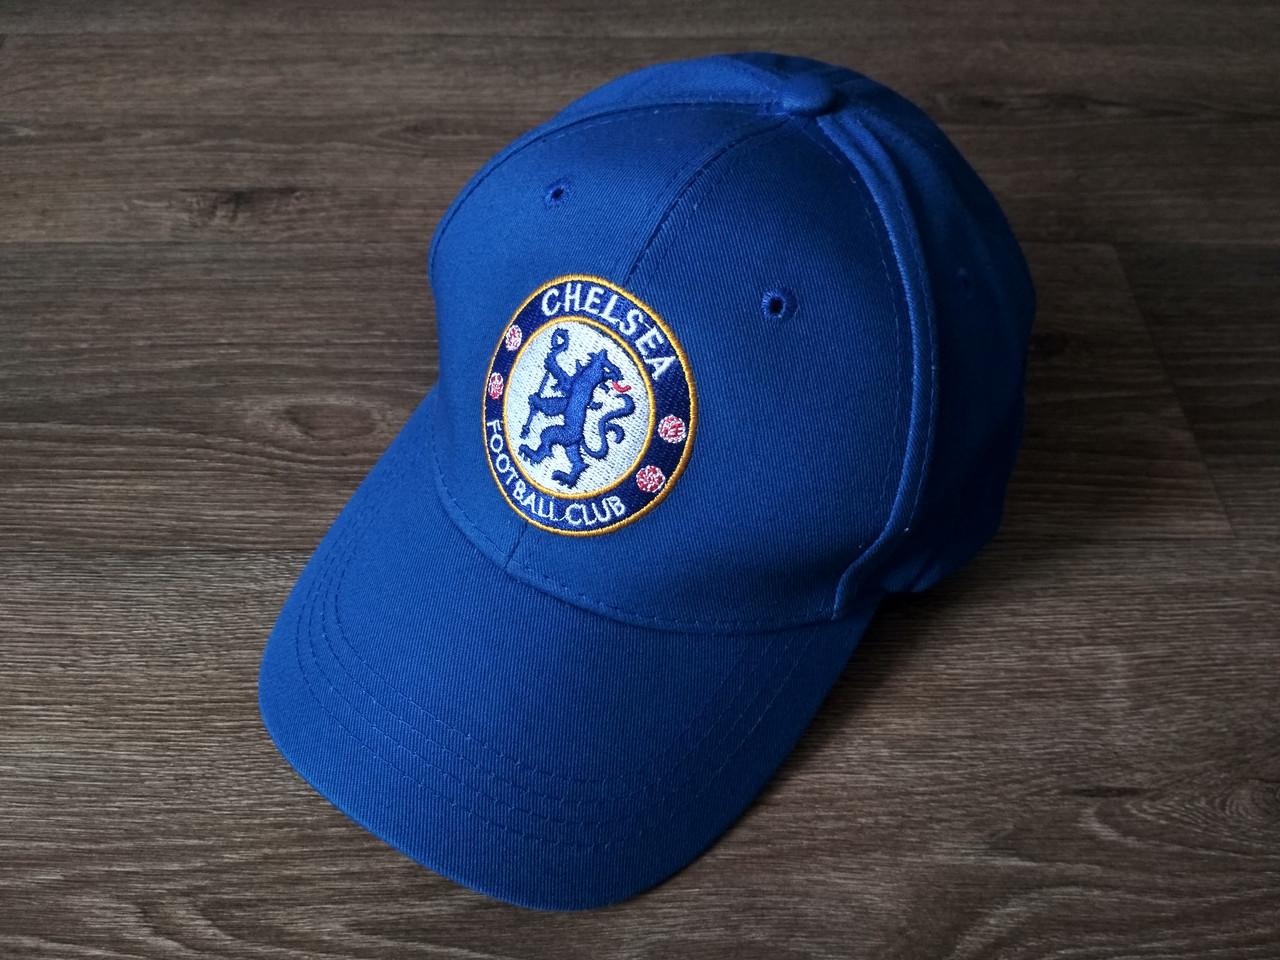 Футбольна Бейсболка / кепка Челсі / Chelsea синя 19-20